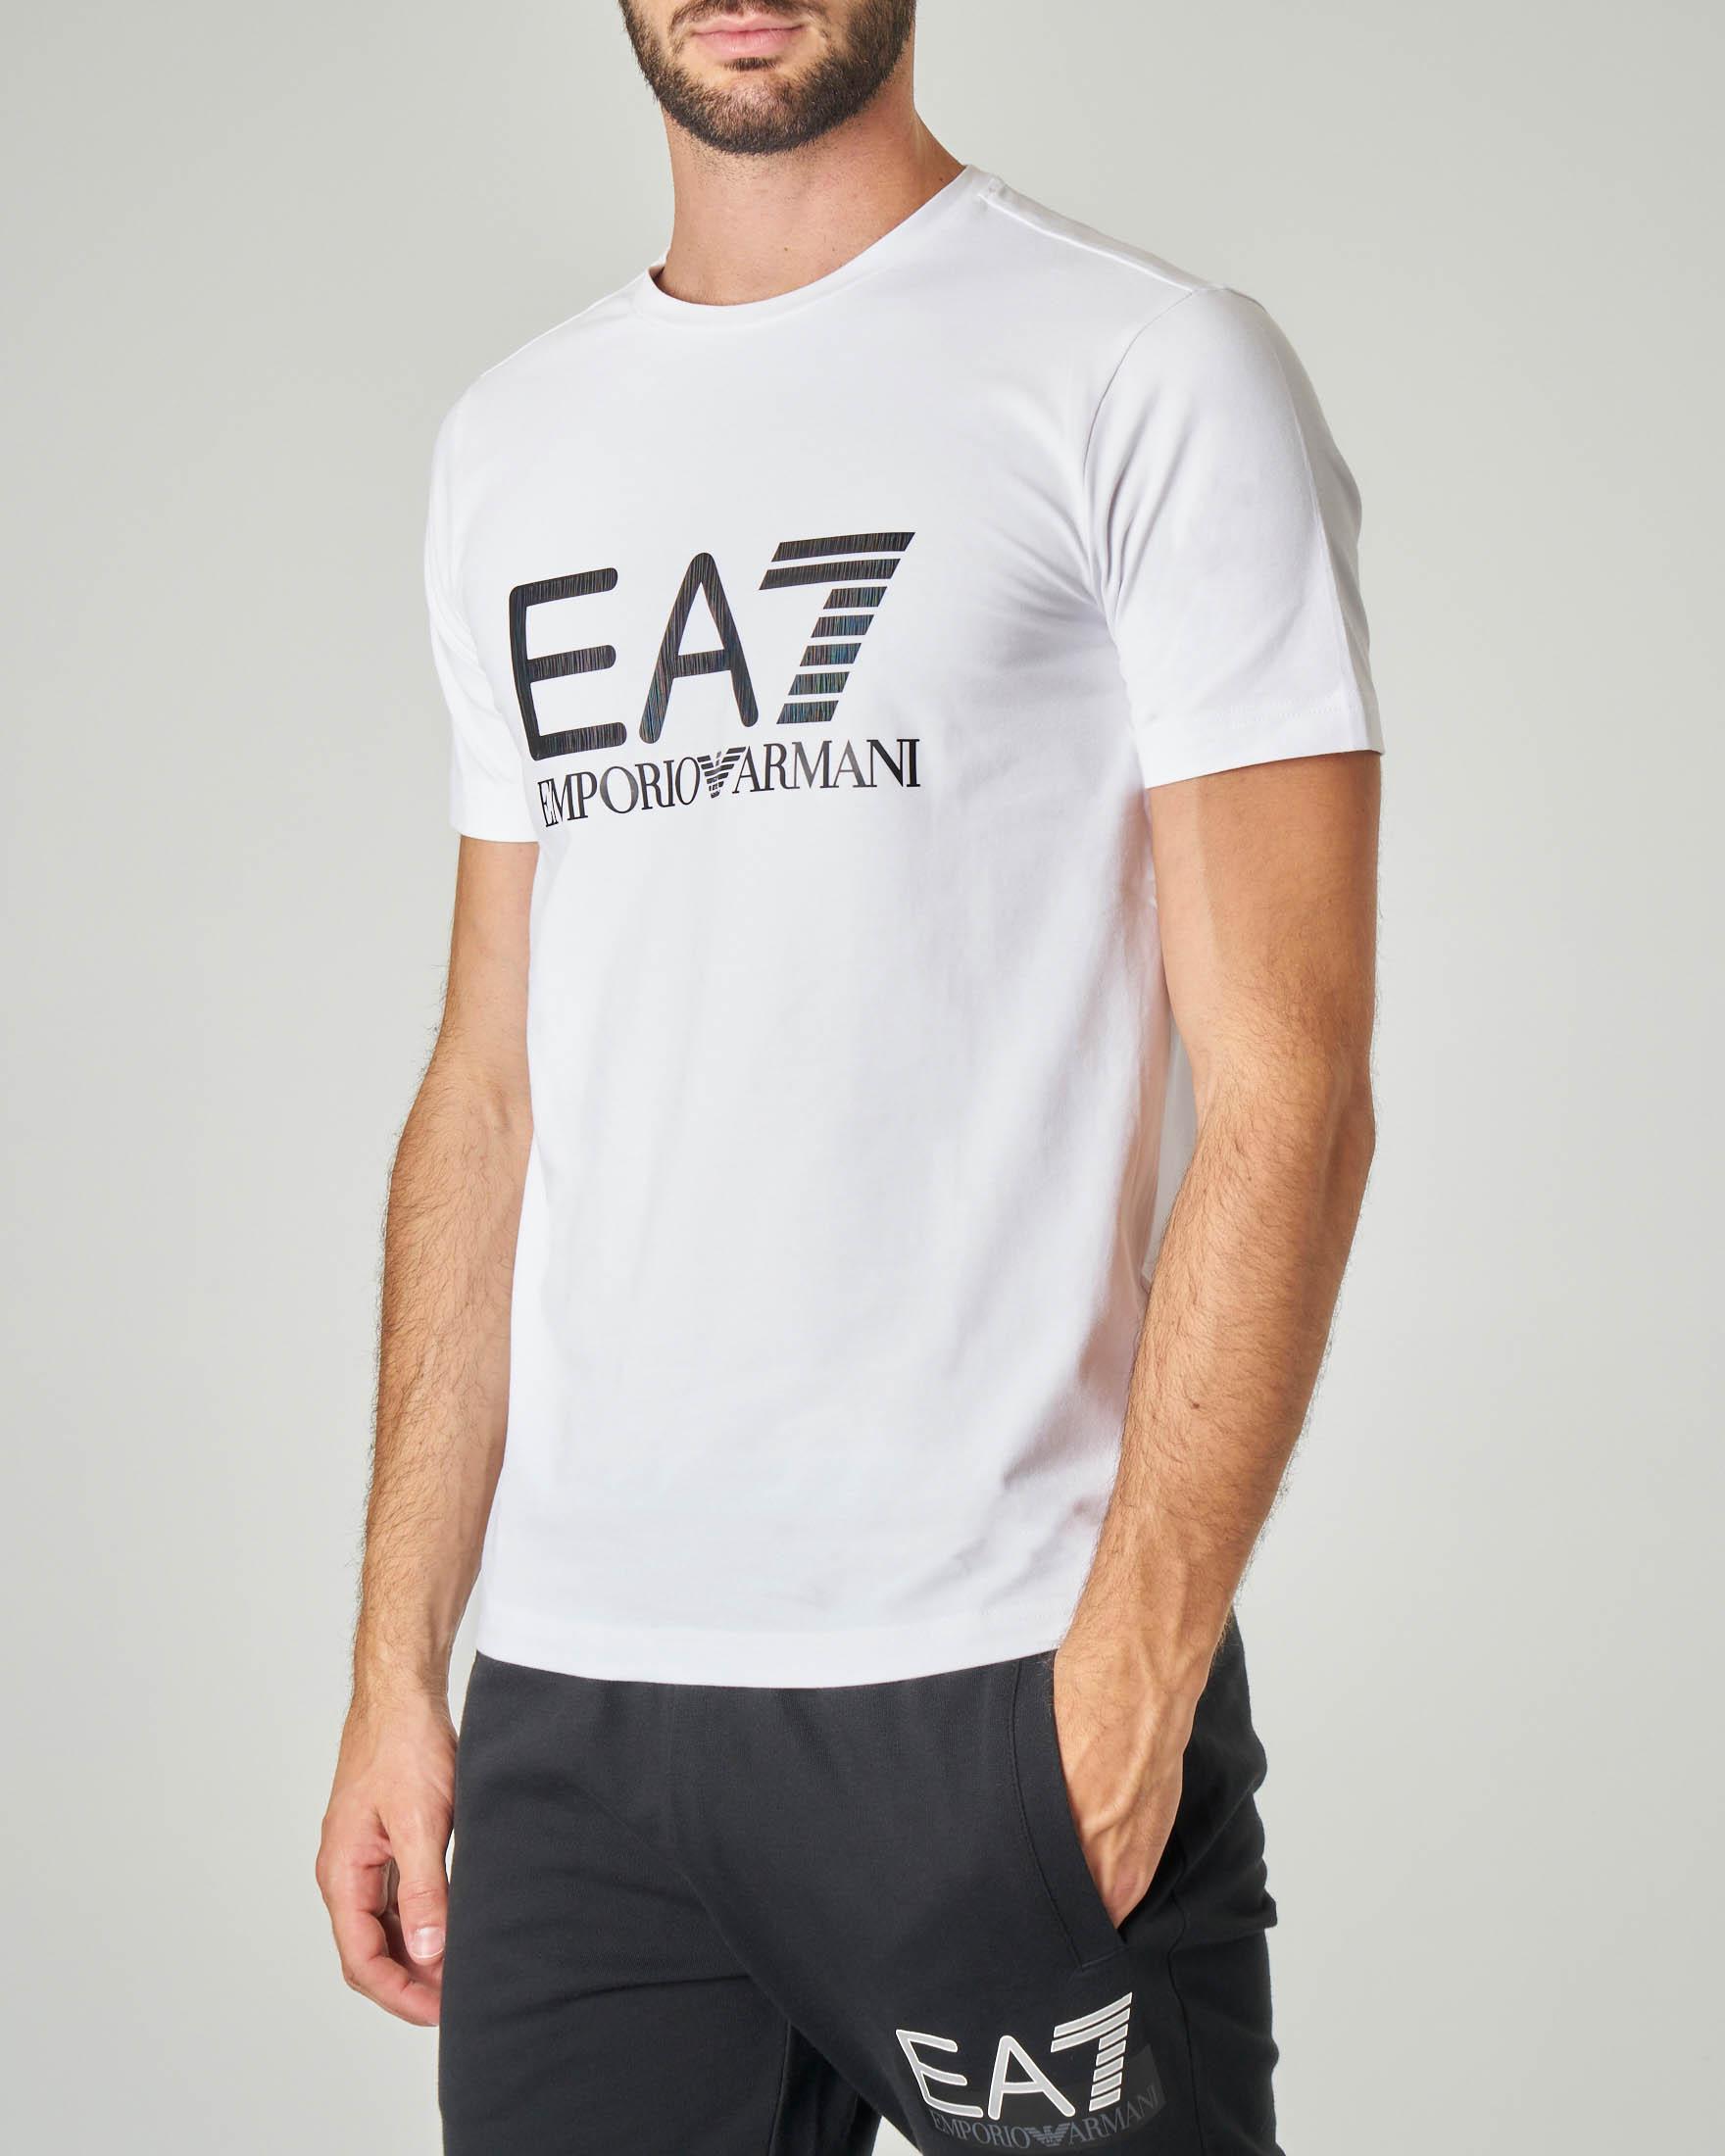 T-shirt bianca in cotone stretch con logo cangiante